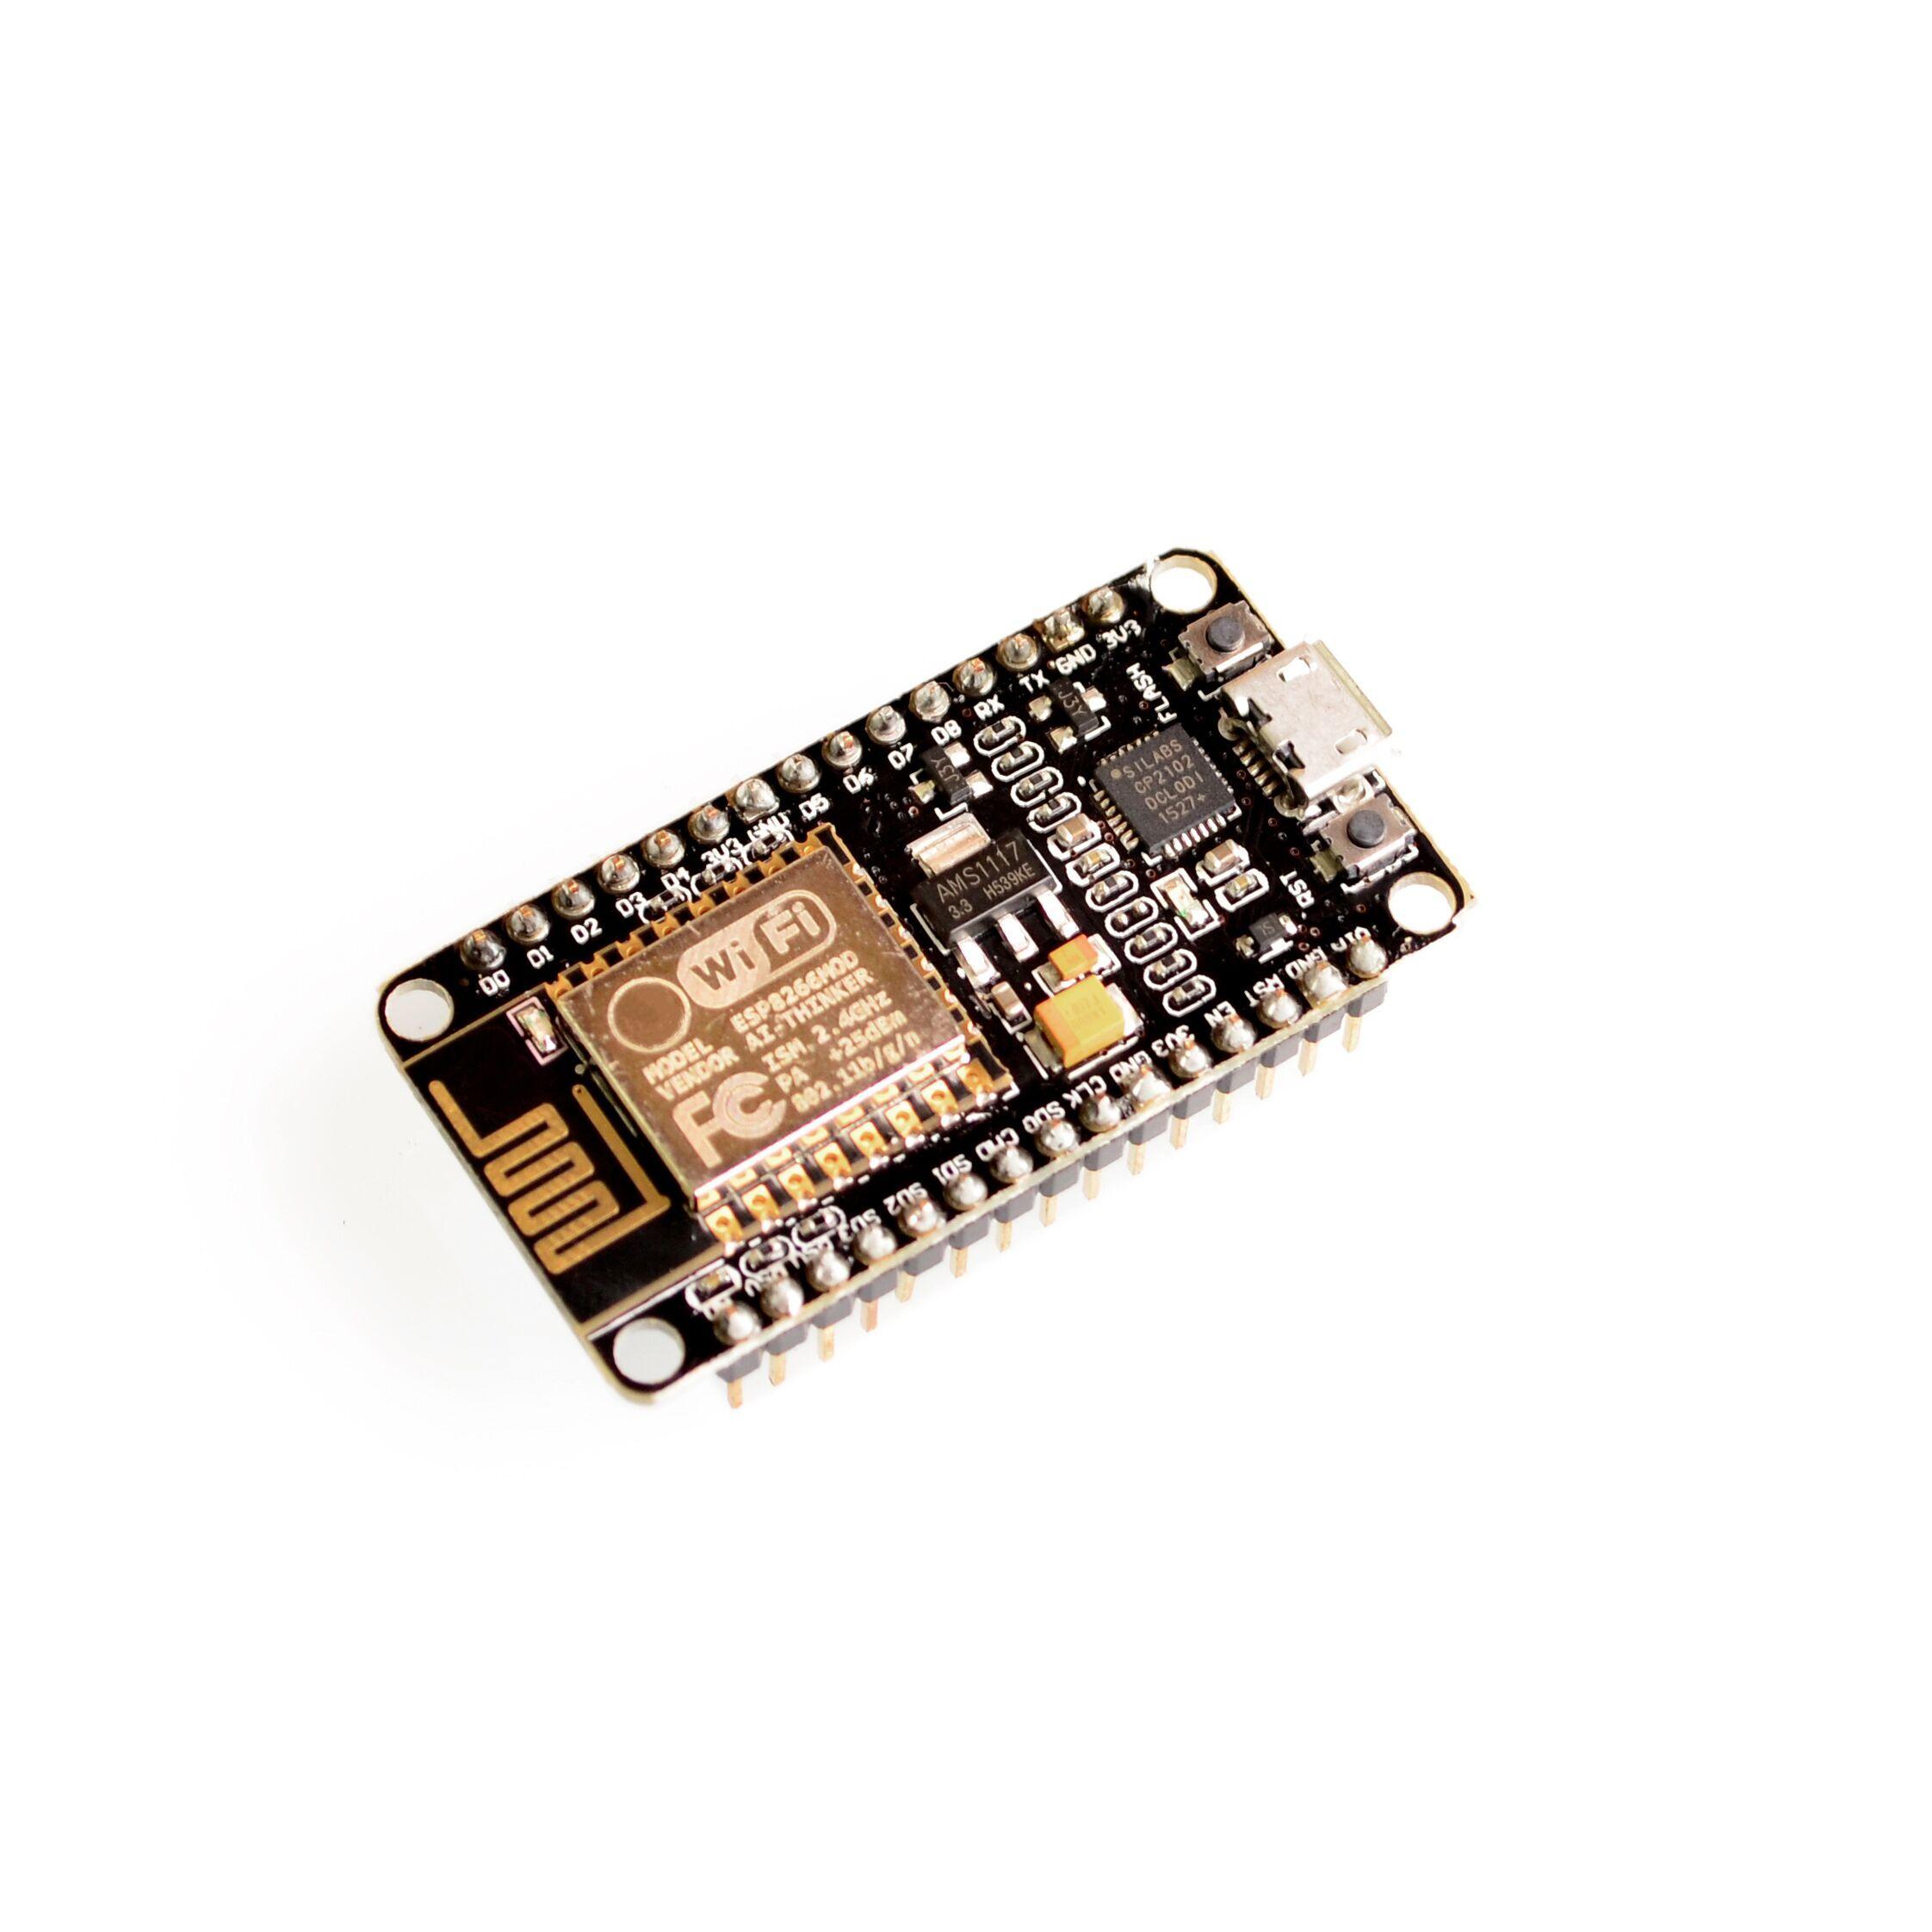 esp8266 cp2102 NodeMCU v2 Lua WIFI networking development kit board based on ESP8266 amica